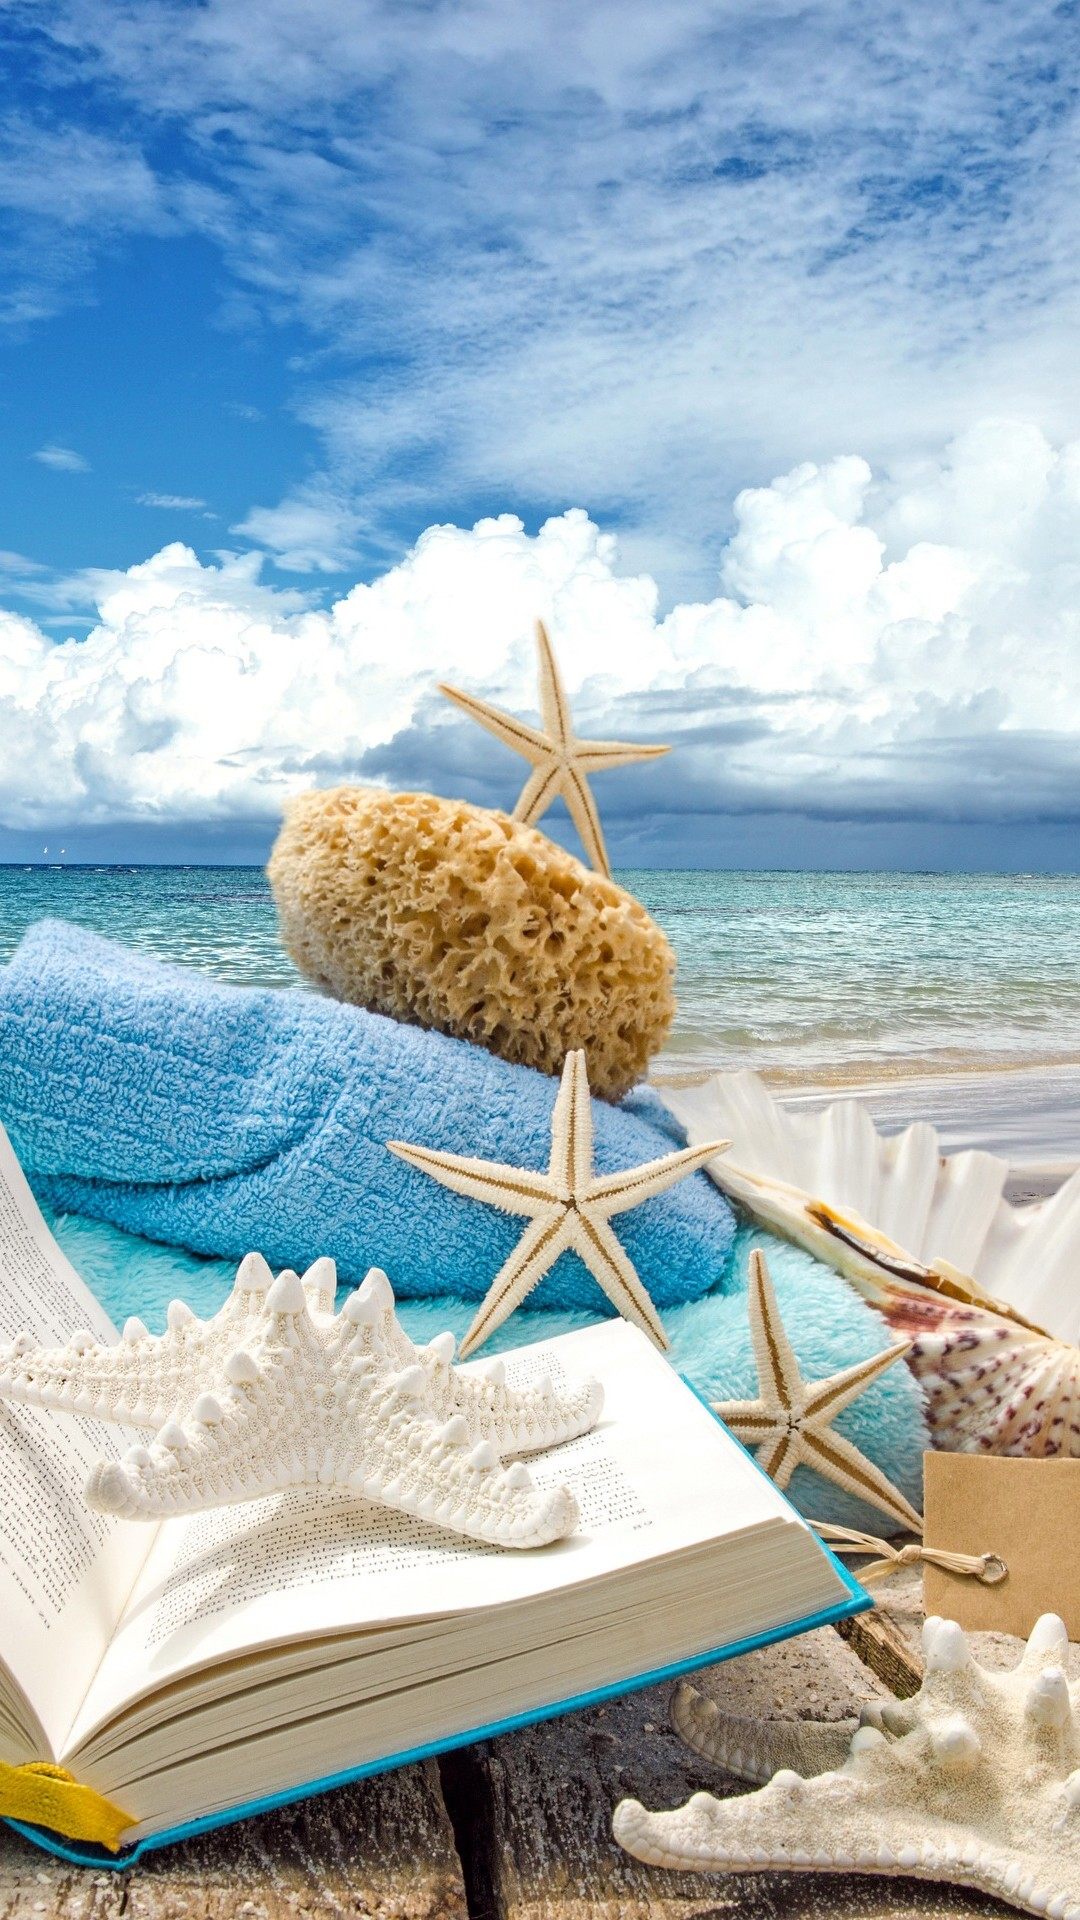 … Summer Iphone Wallpaper Summer Beach Book Seashells Sea Stars iPhone 6  Plus HD Wallpaper …